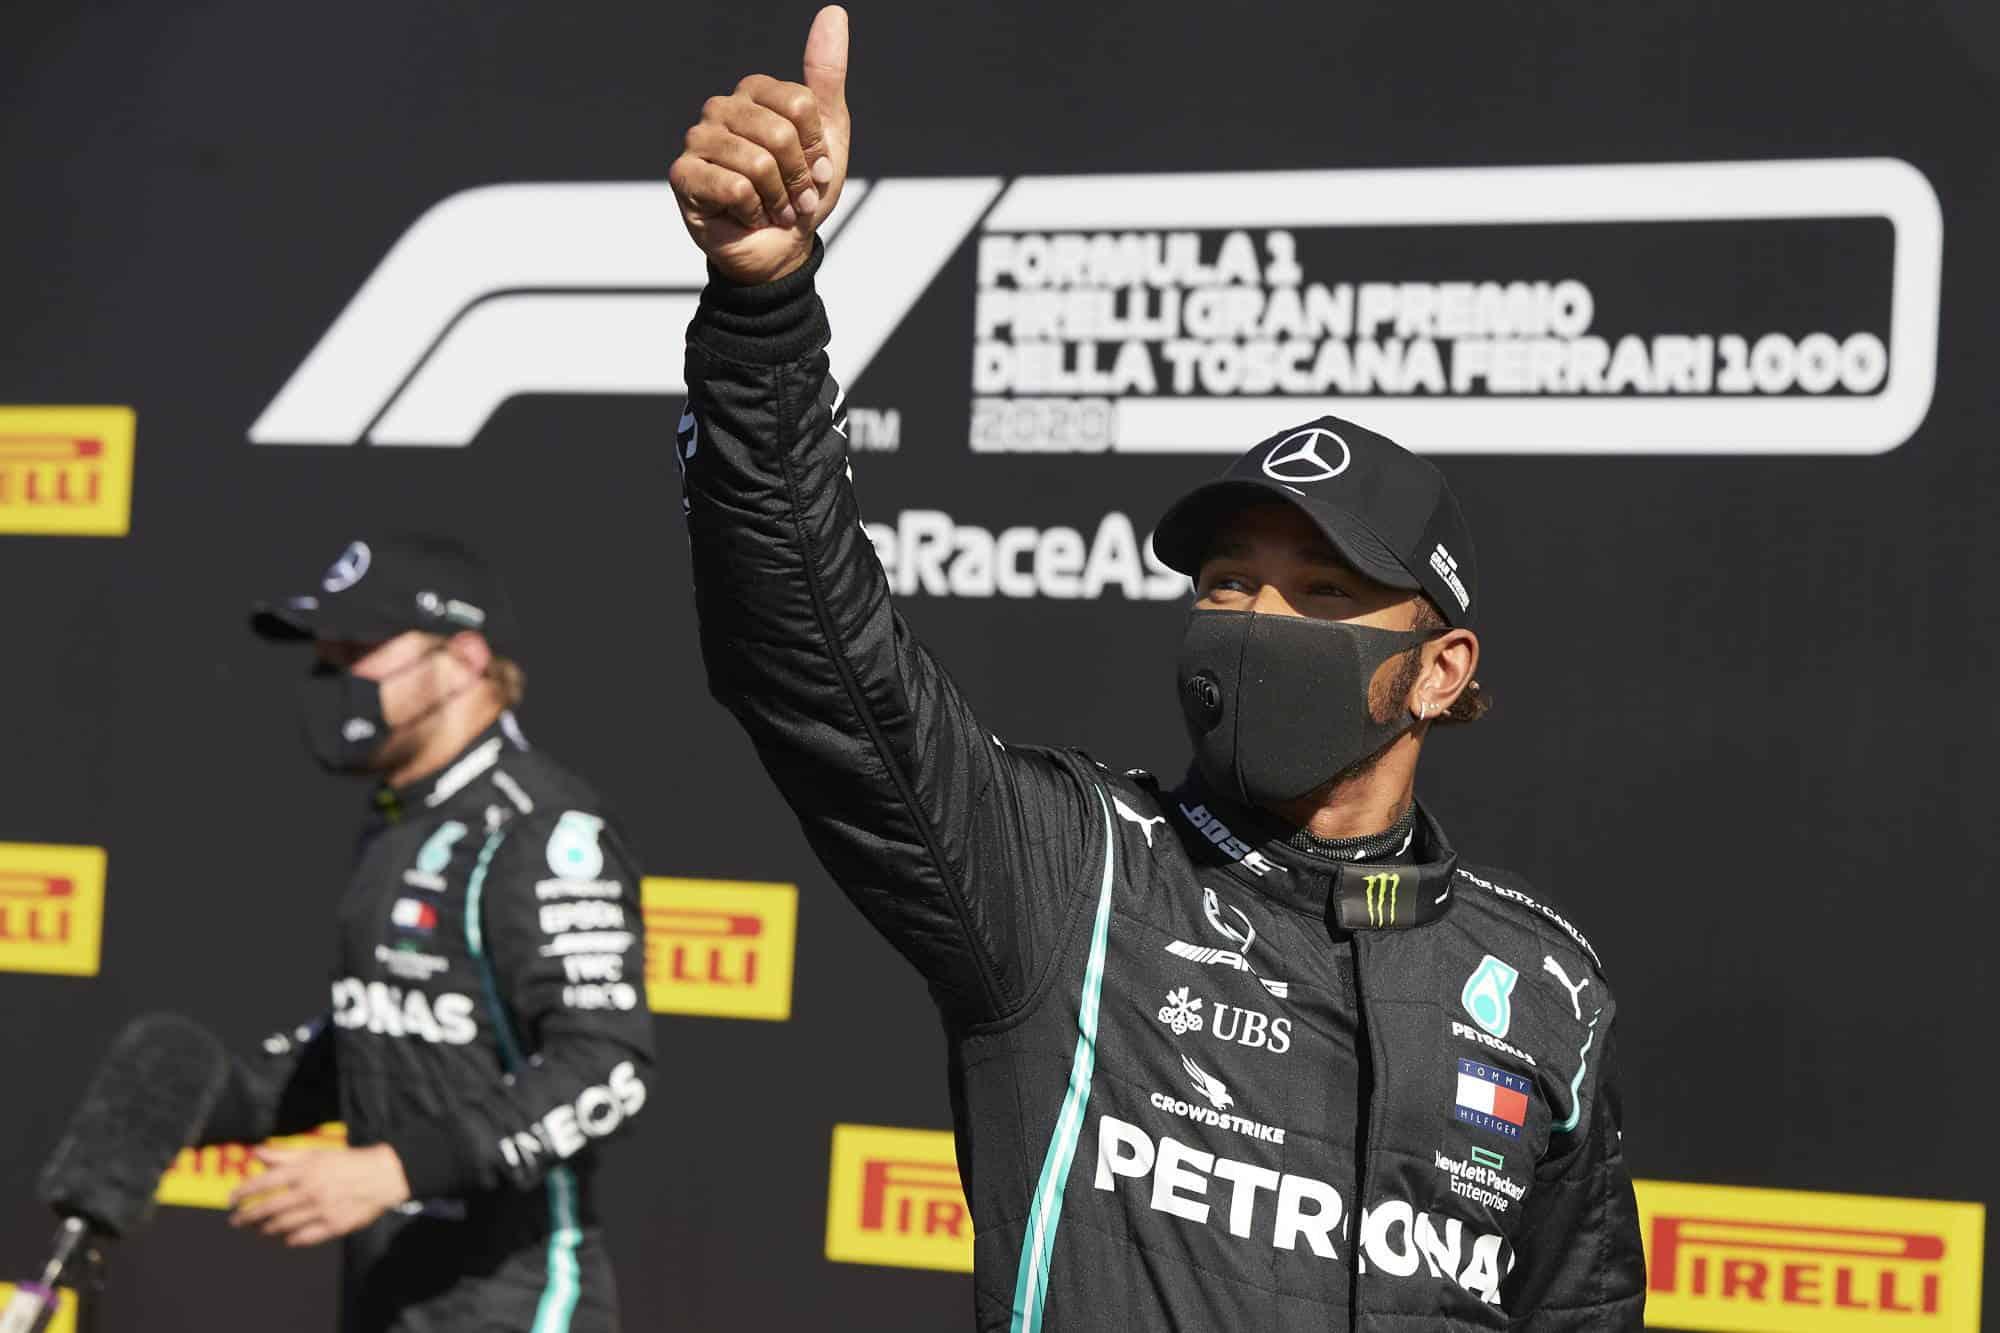 2020 Tuscan GP Hamilton Bottas Mercedes F1 W11 after qualifying Photo Daimler